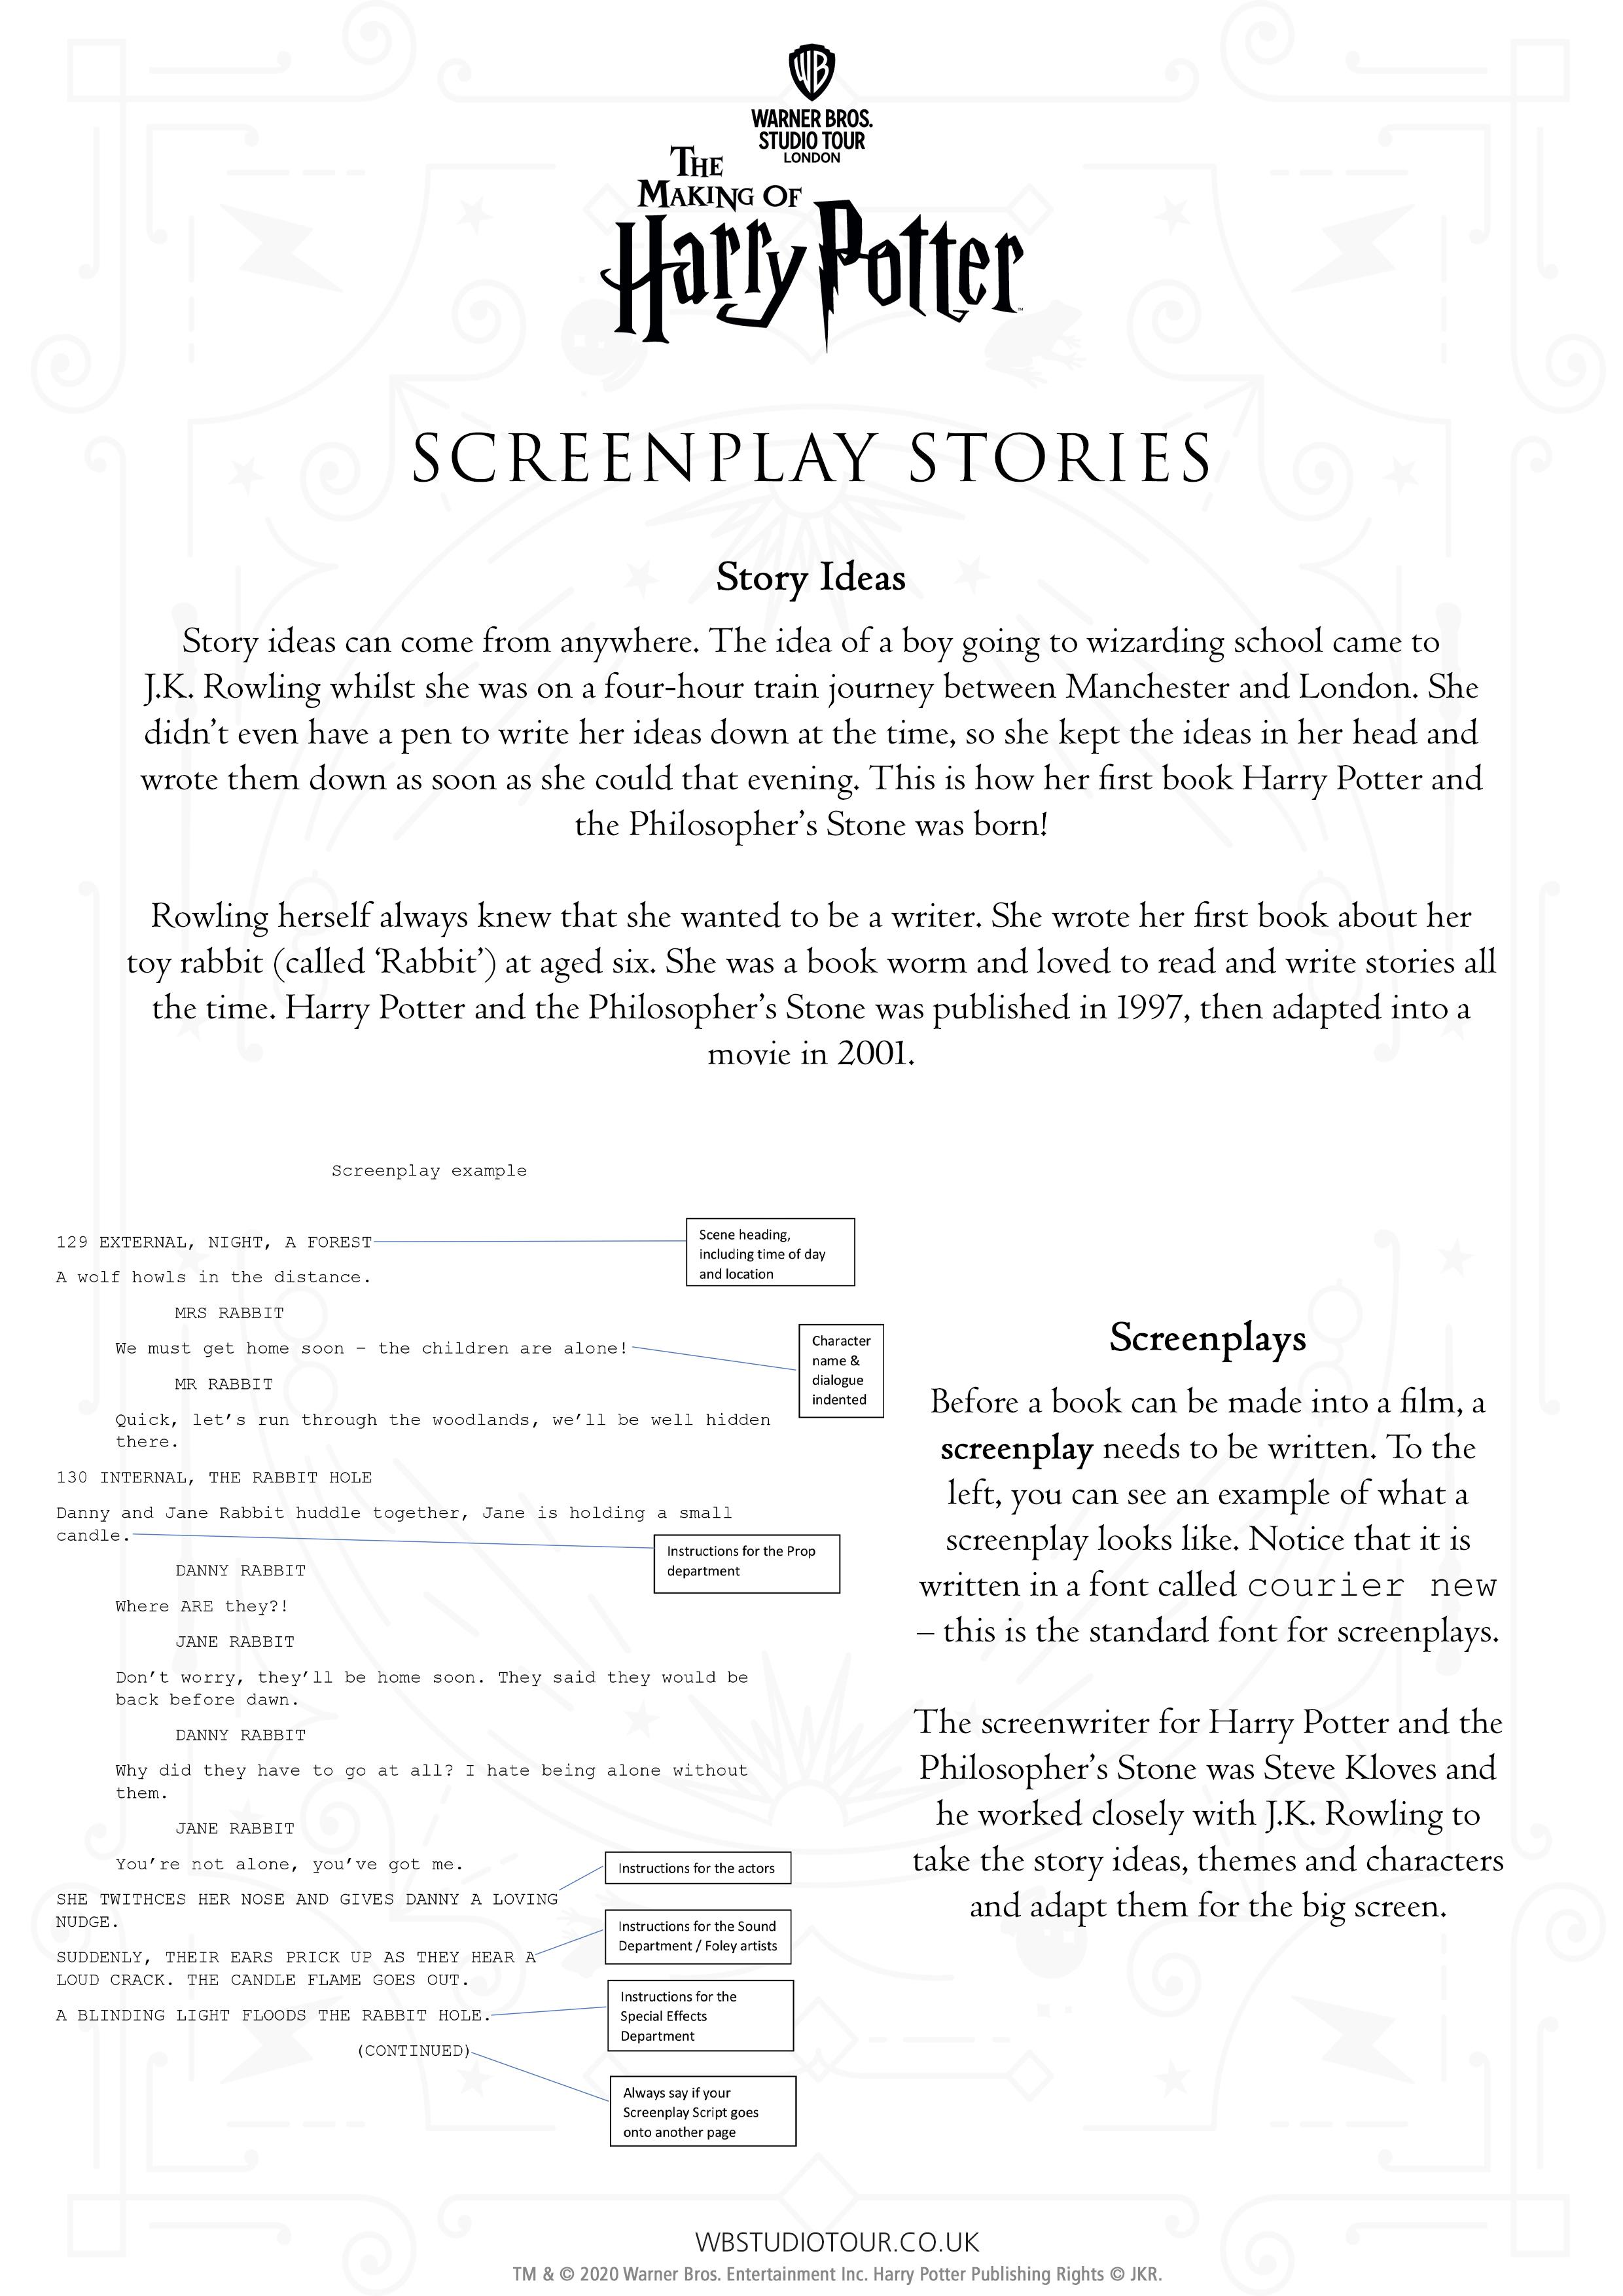 Screenplay activity sheet page 1